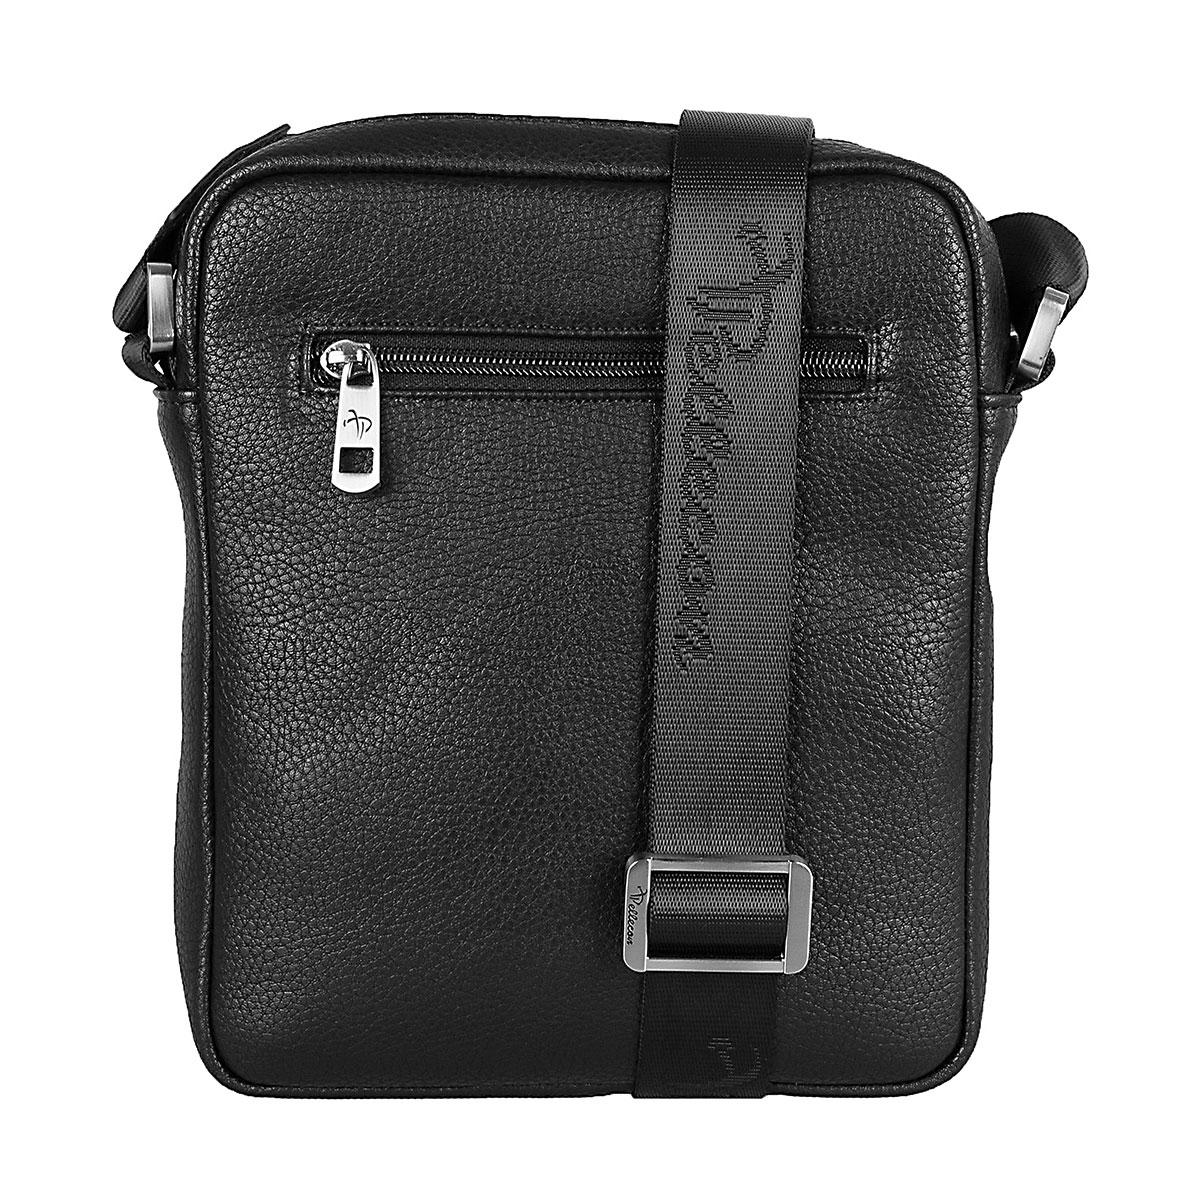 812-81435-1 Men's Bag Pellekon